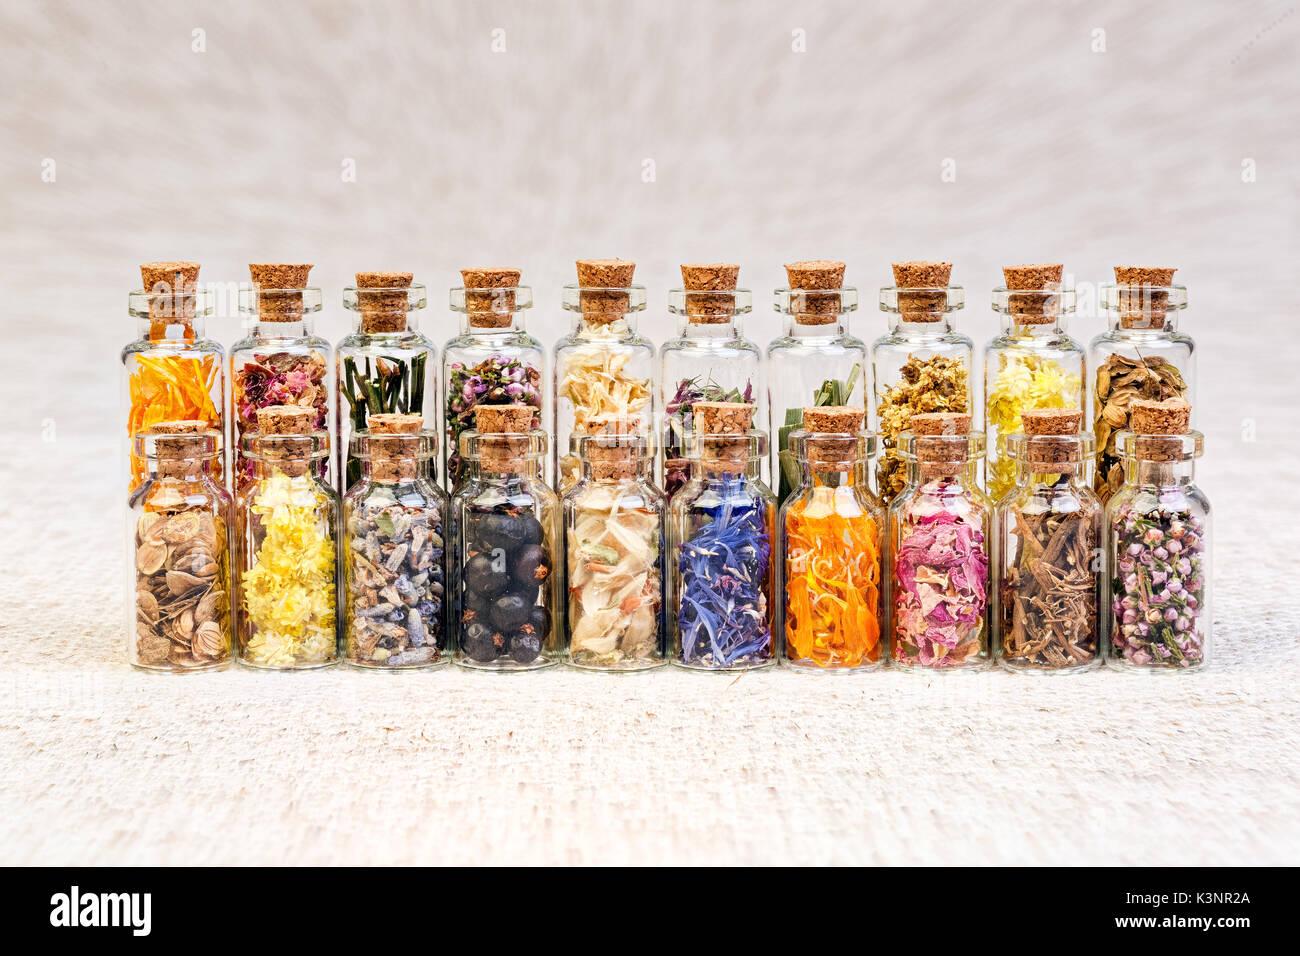 Healing herbs in glass bottles, macro photo. Stock Photo